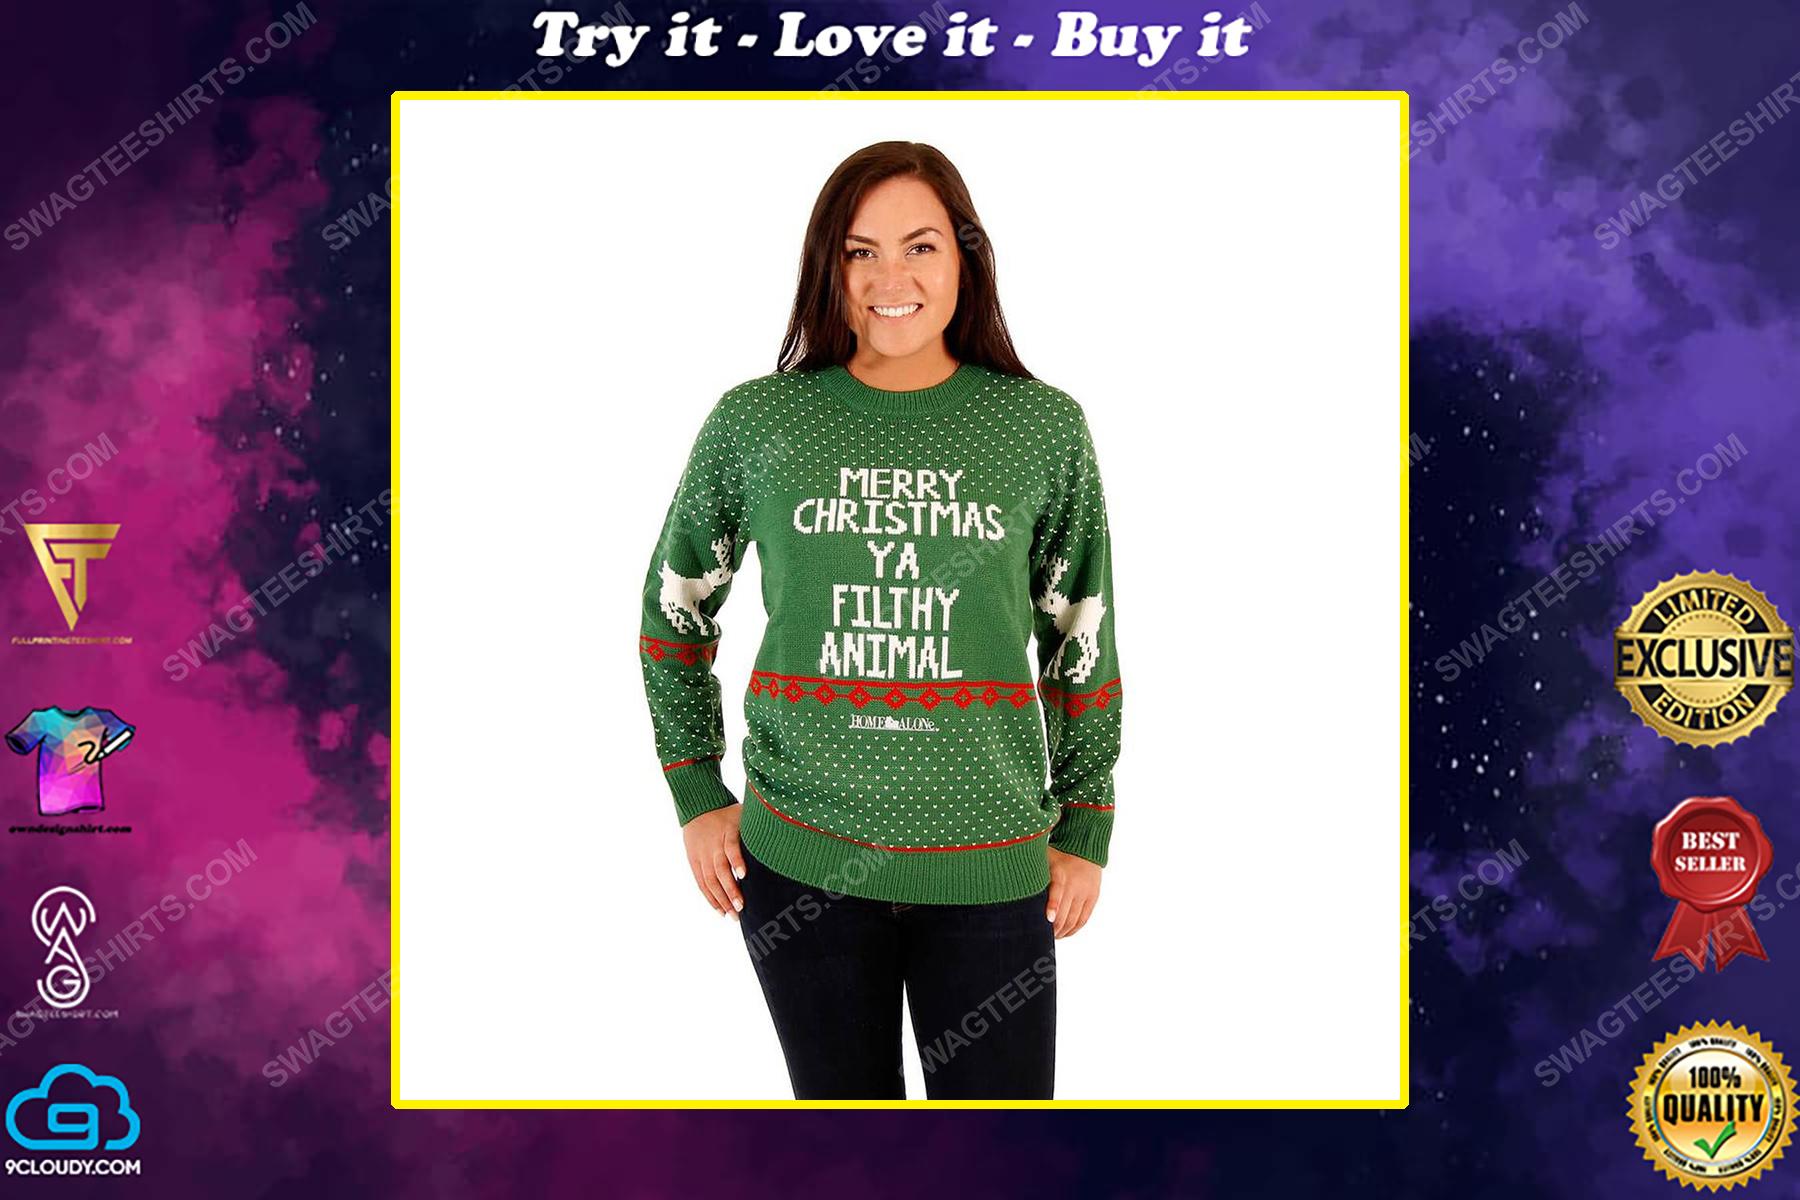 Merry christmas ya filthy animal reindeer full print ugly christmas sweater